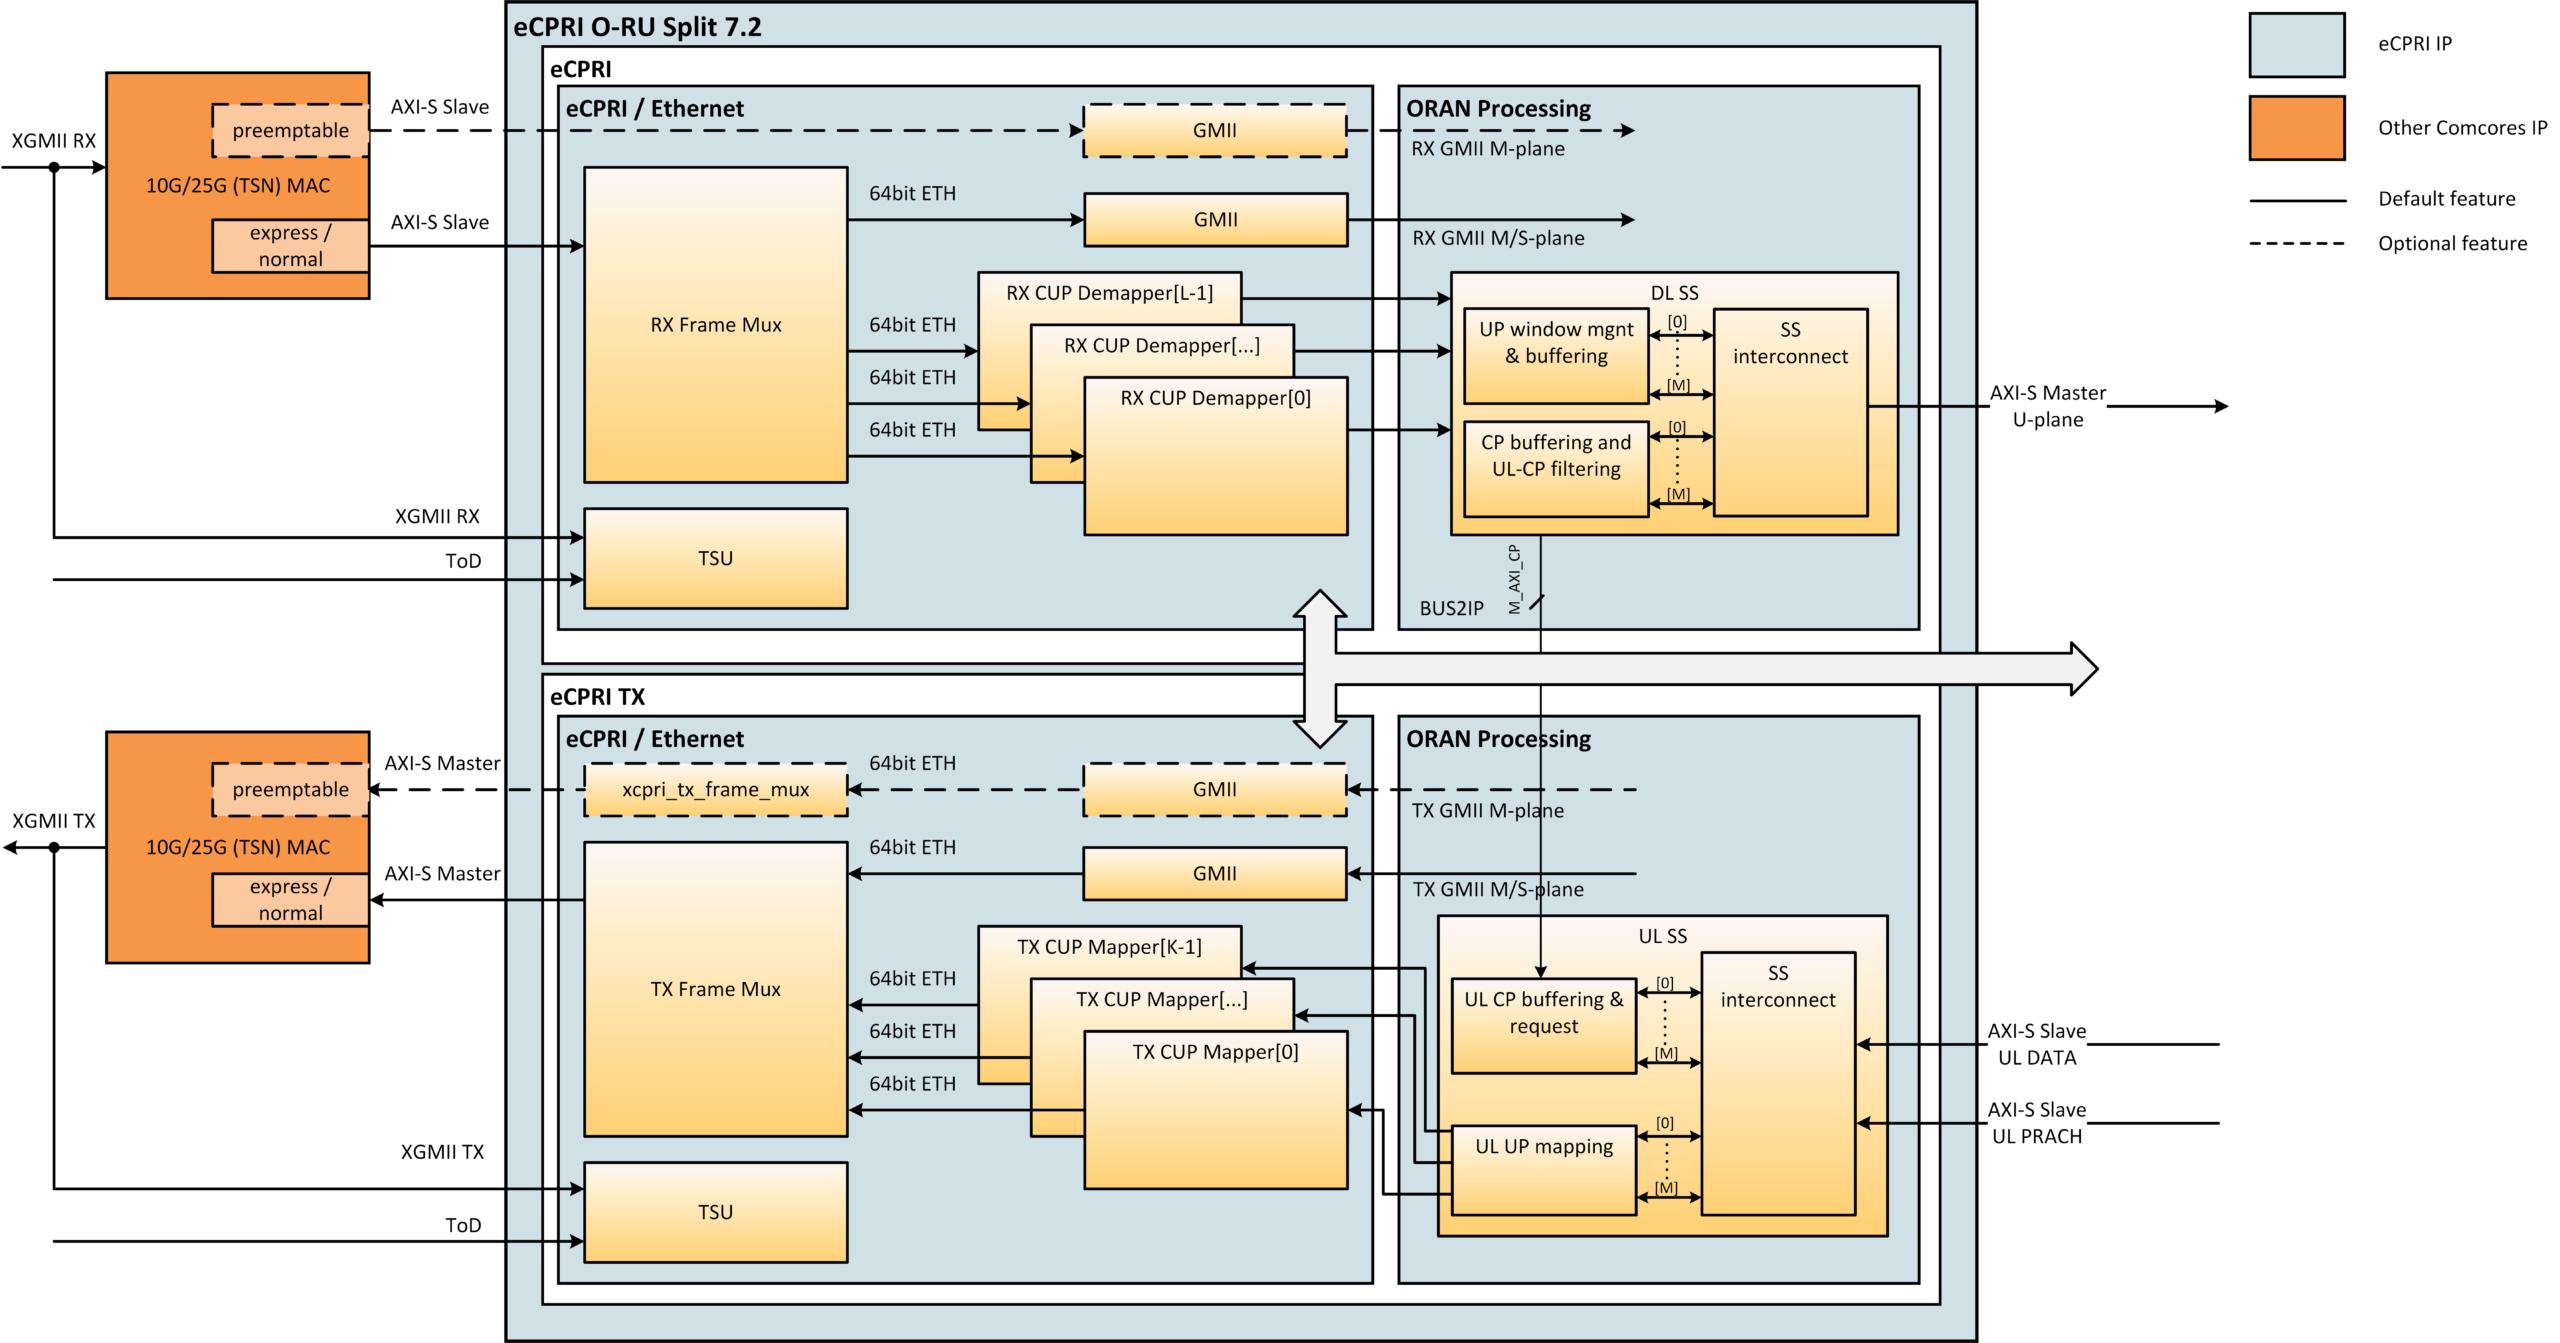 eCPRI O-RU Split 7.2 Block Diagram